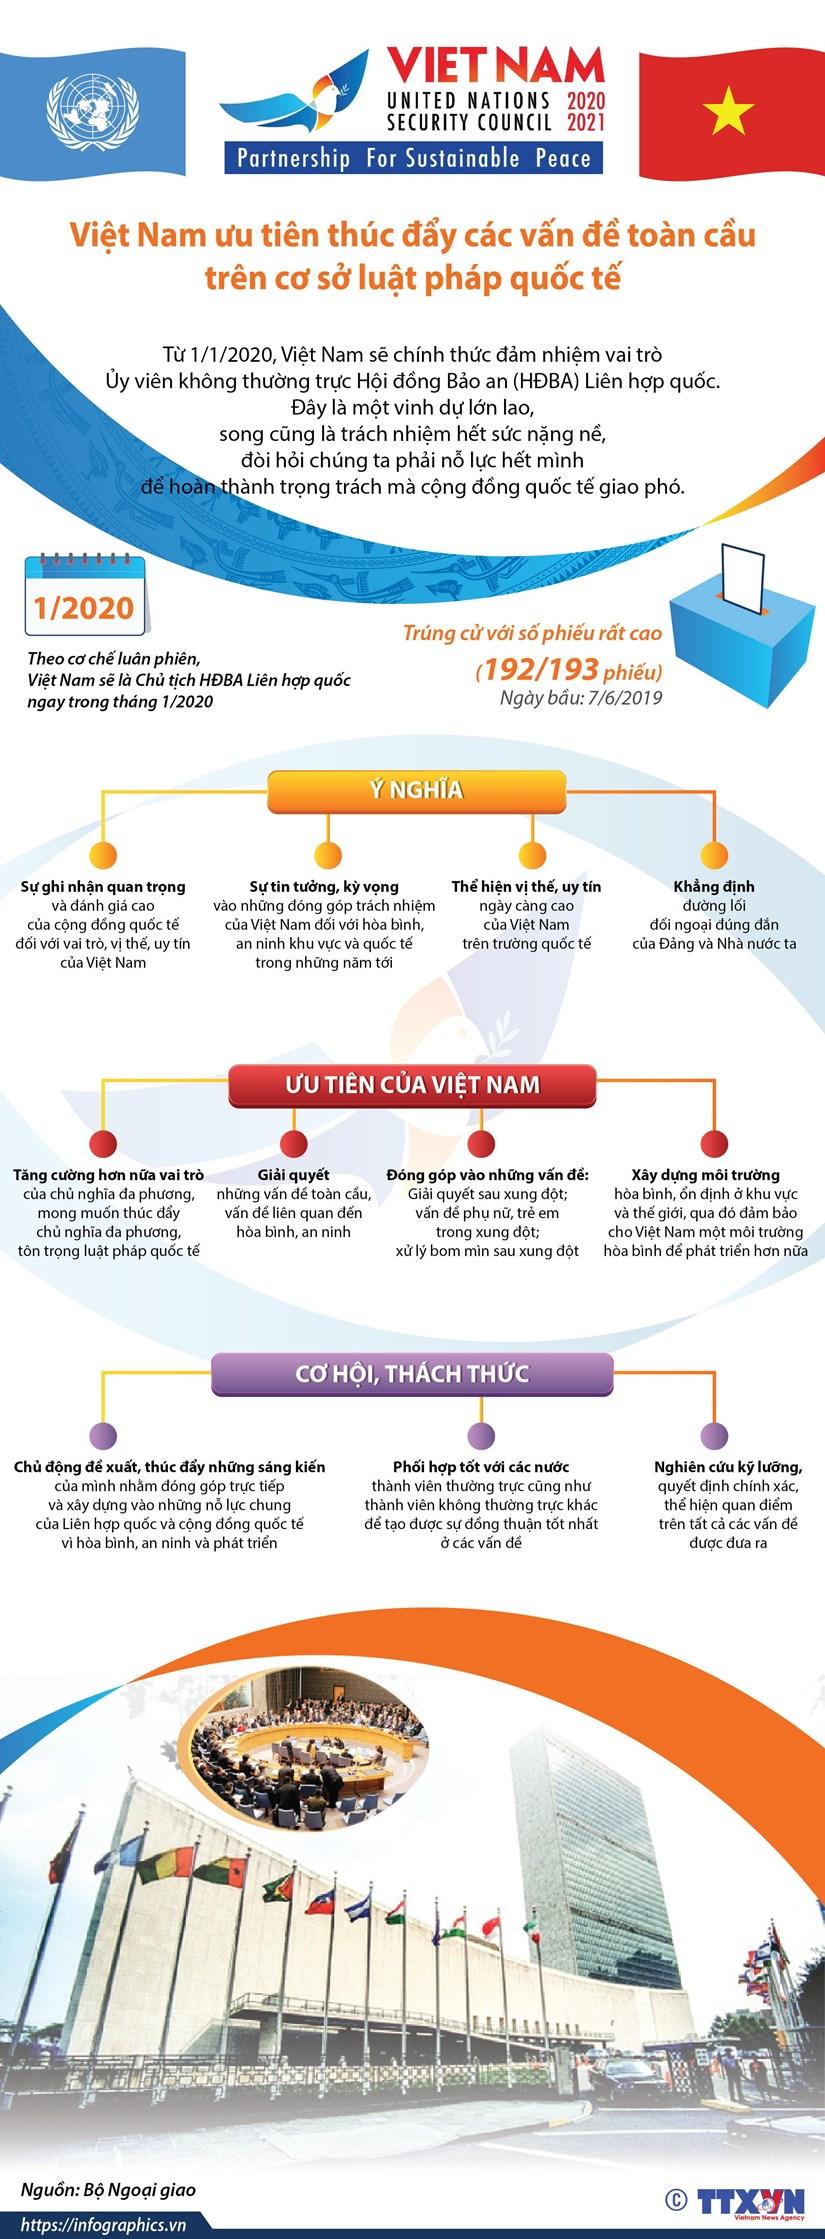 [Infographics] Viet Nam uu tien thuc day cac van de toan cau hinh anh 1